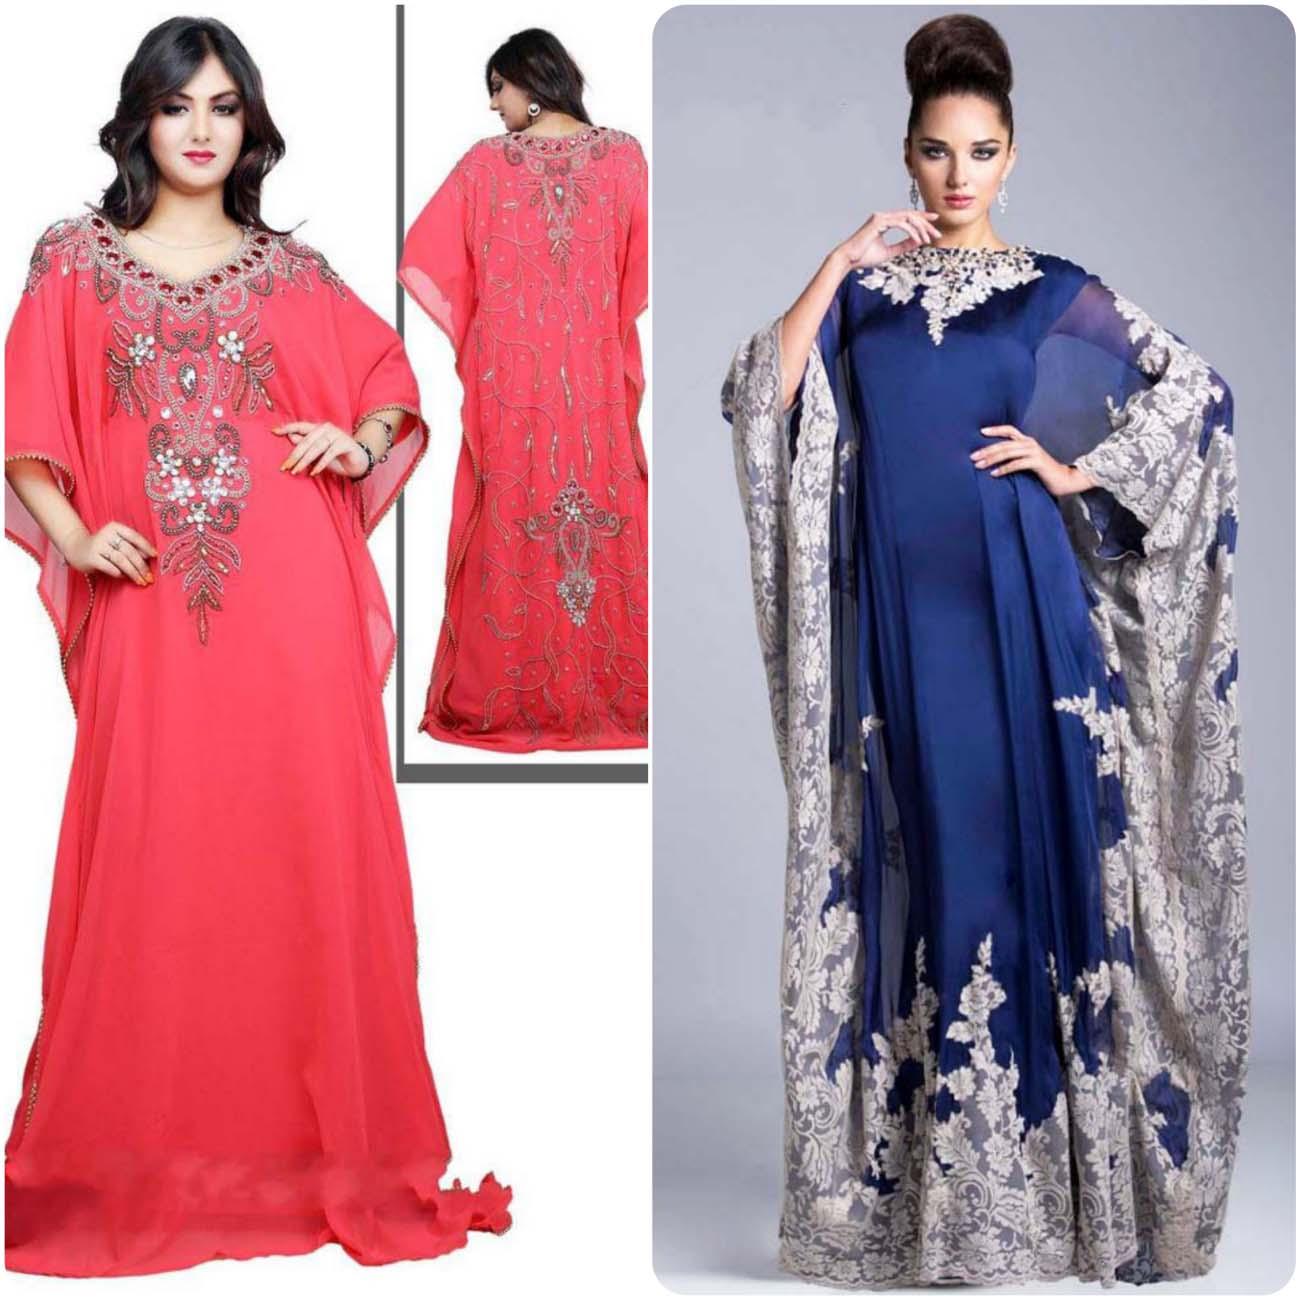 Designers Abaya Dresses Designs For Wedding Bridals 2016-2017...styloplanet (18)